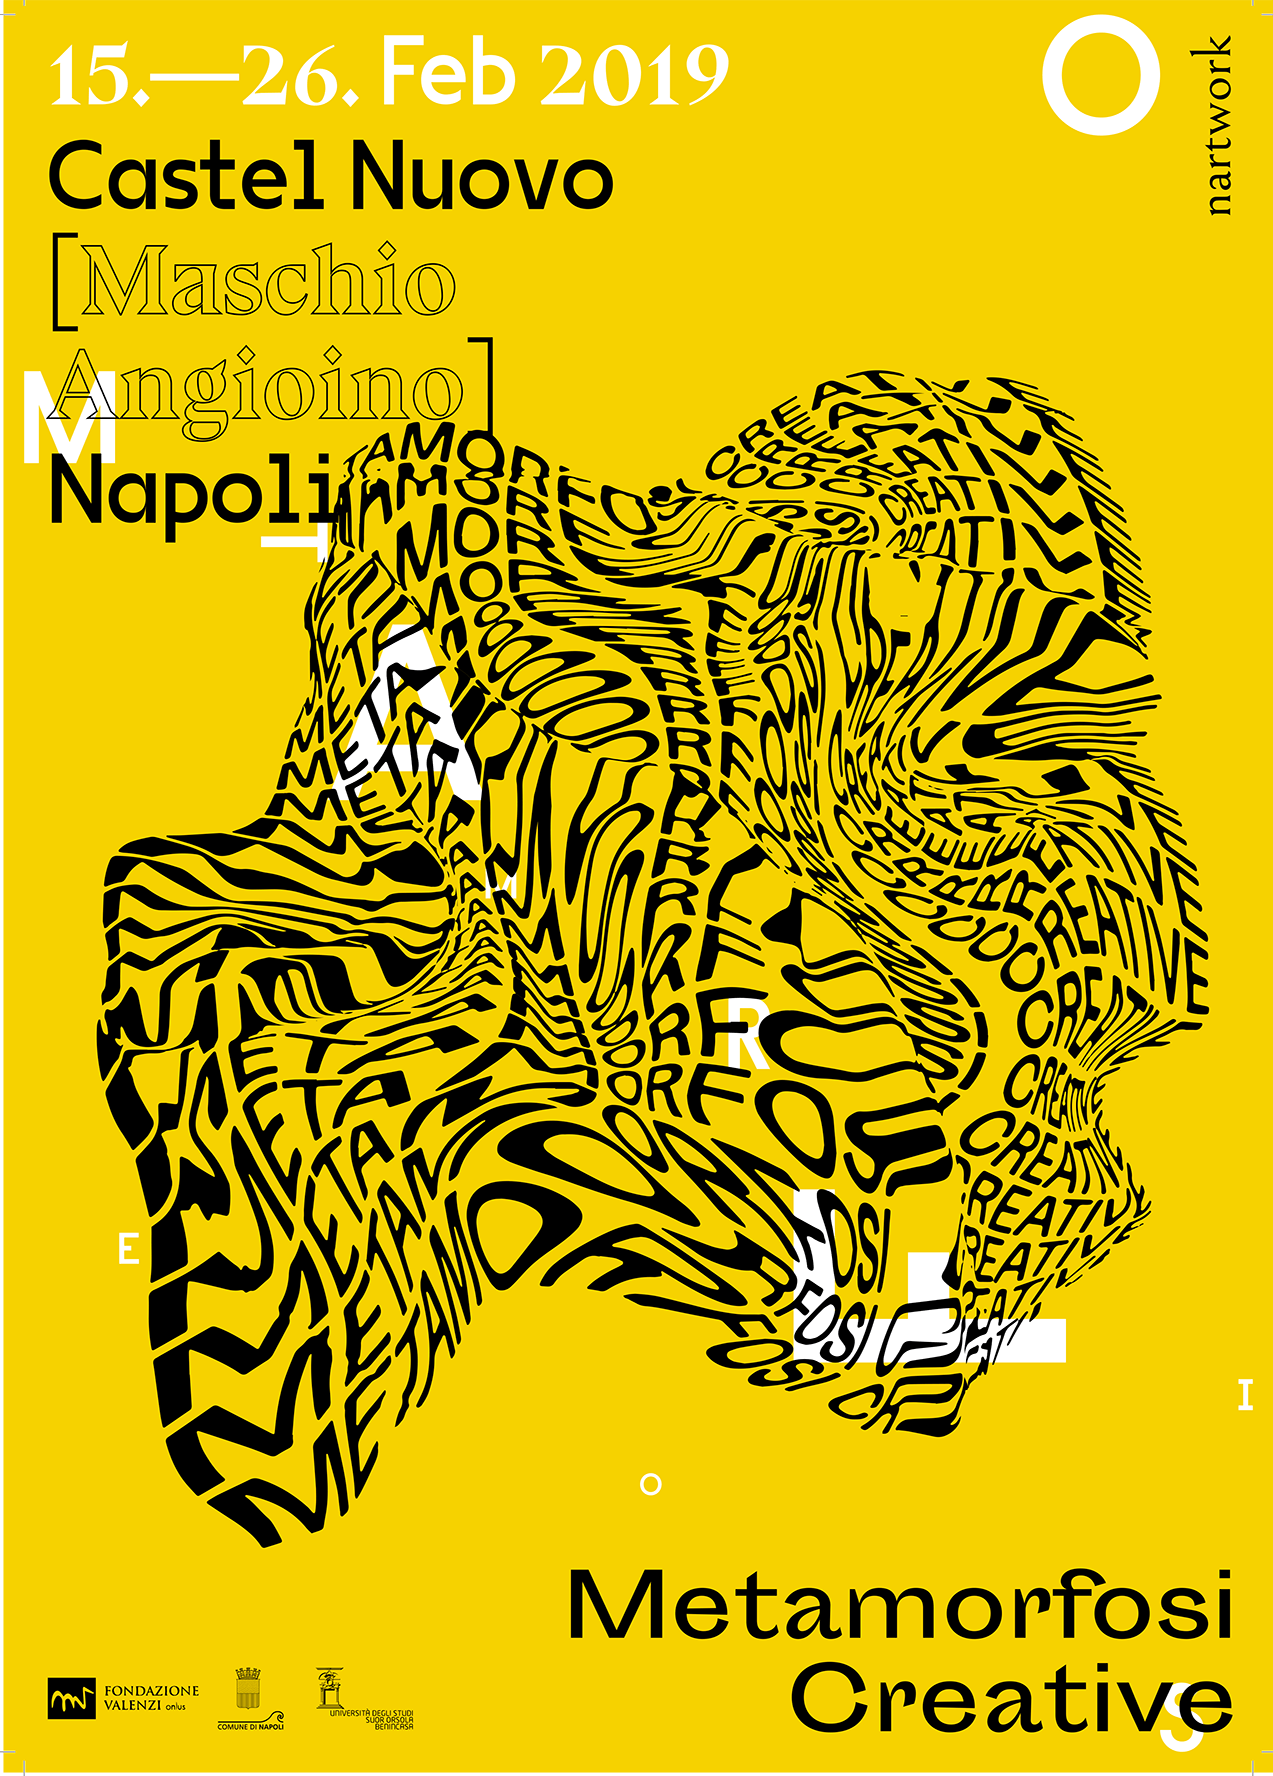 Metamorfosi Creative